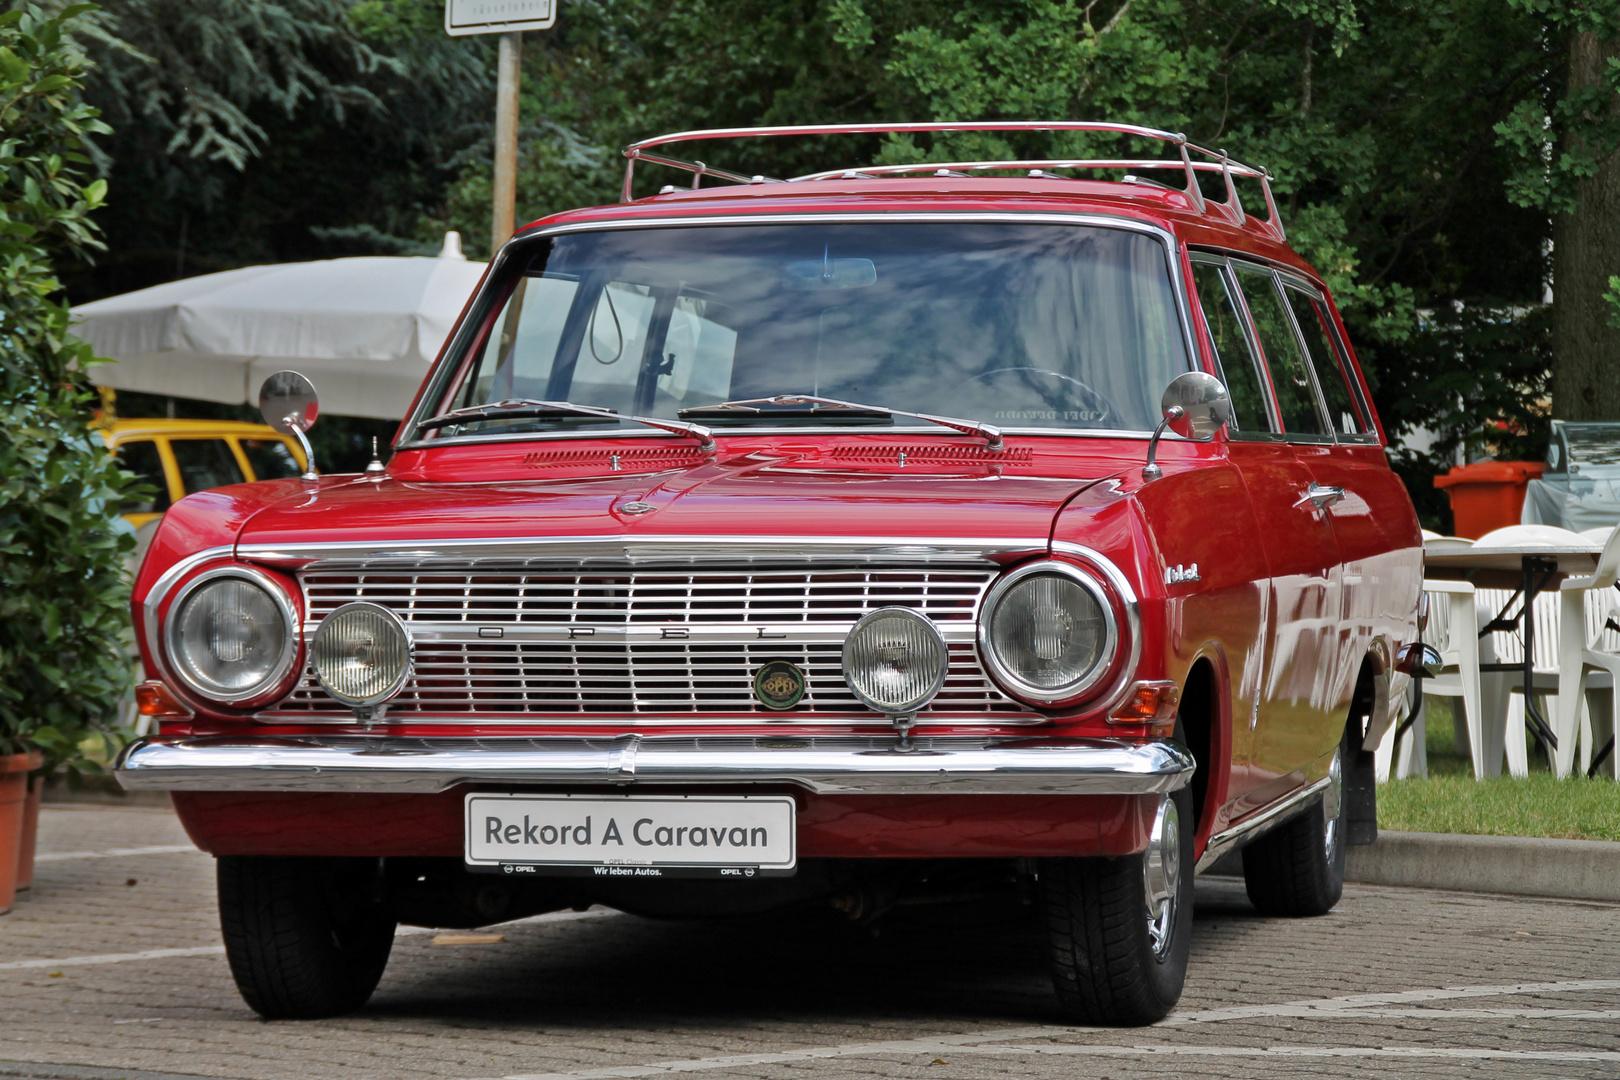 Opel Rekord A Caravan